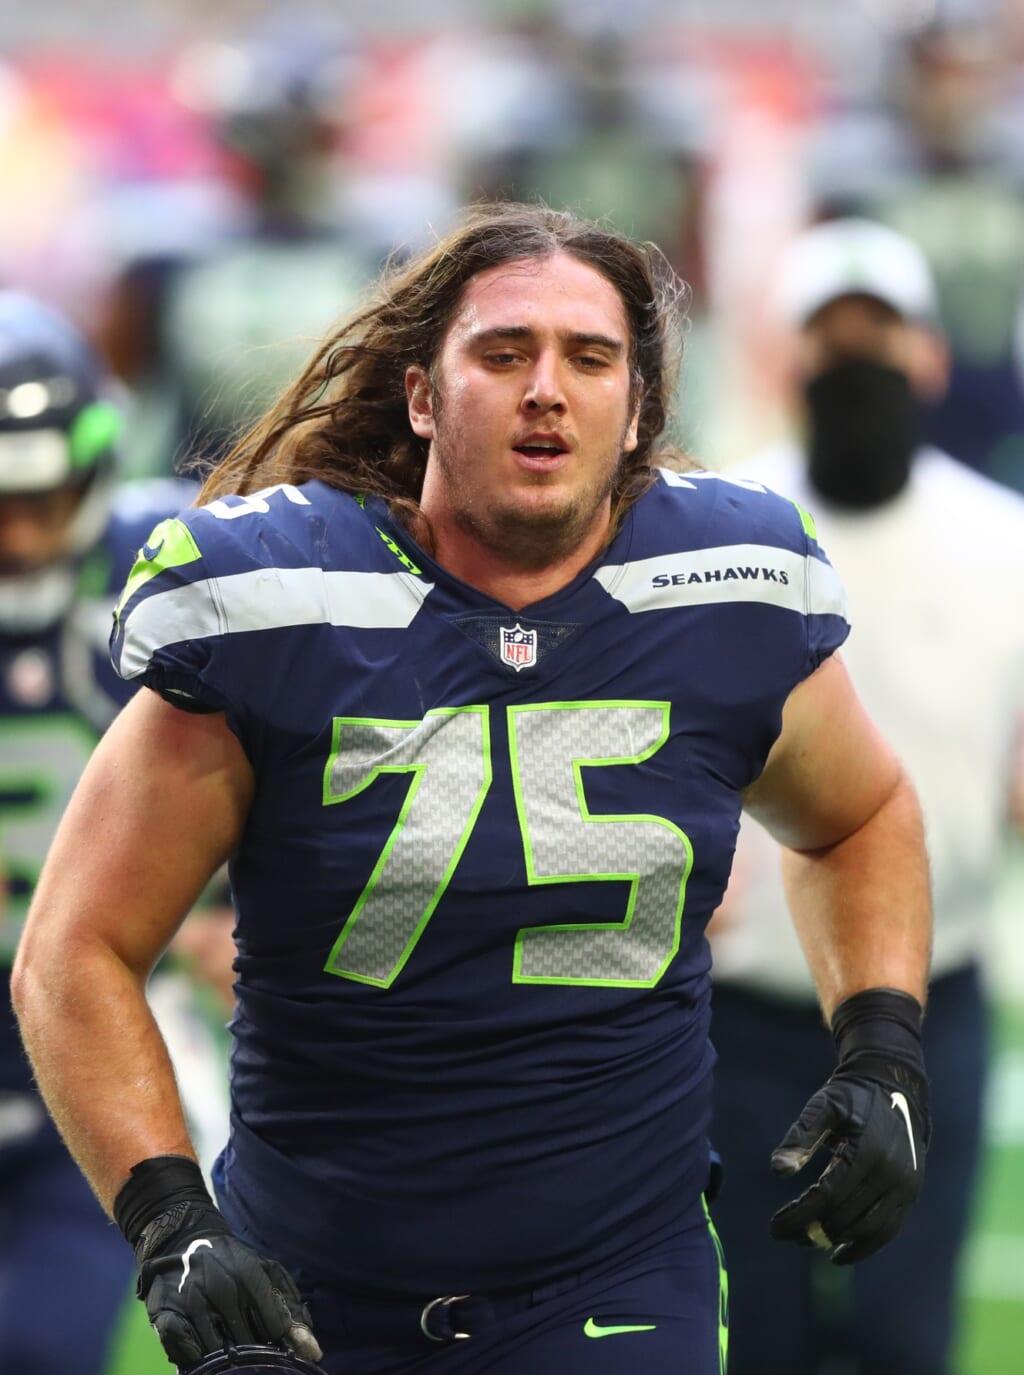 Seahawks' Chad Wheeler arrested